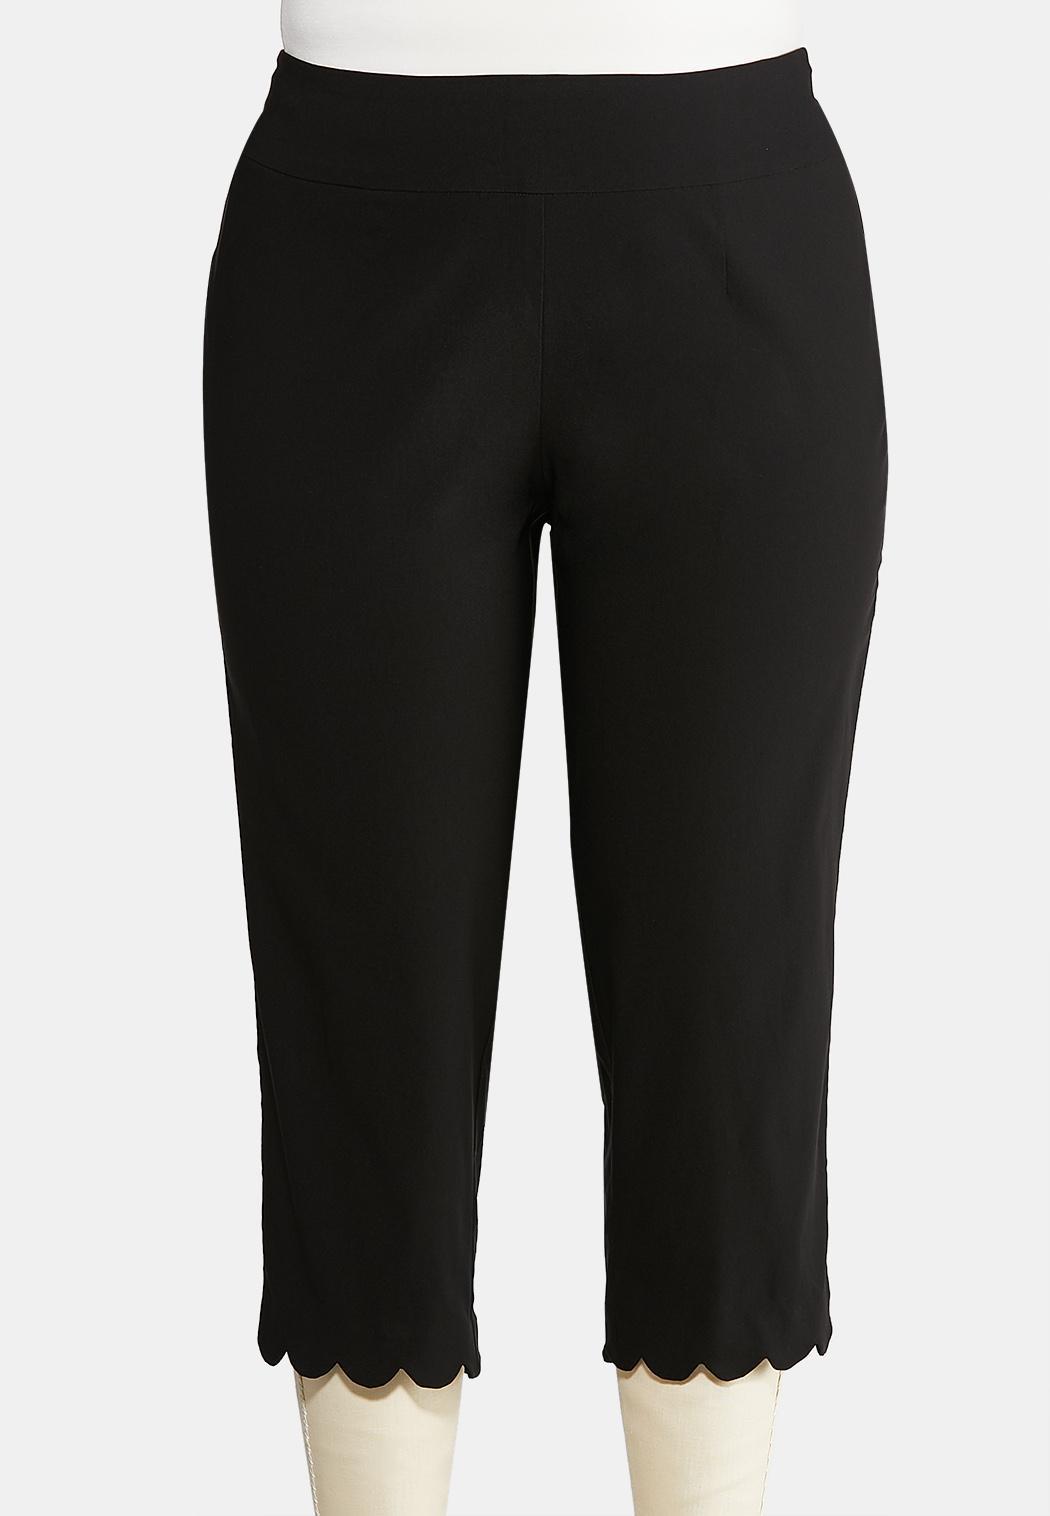 Plus Size Cropped Scalloped Hem Pants